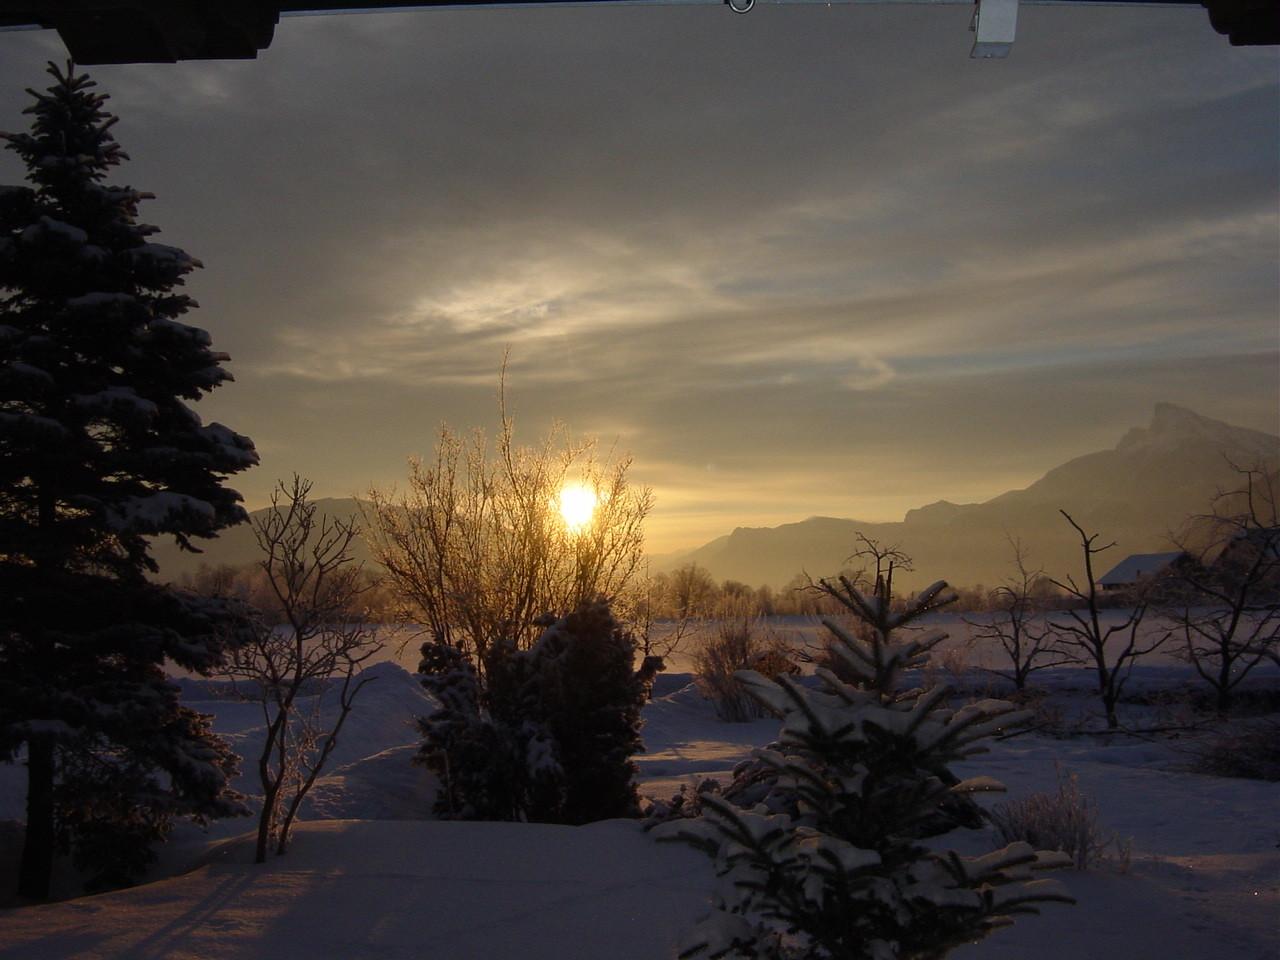 Sonnenaufgang im Winter.